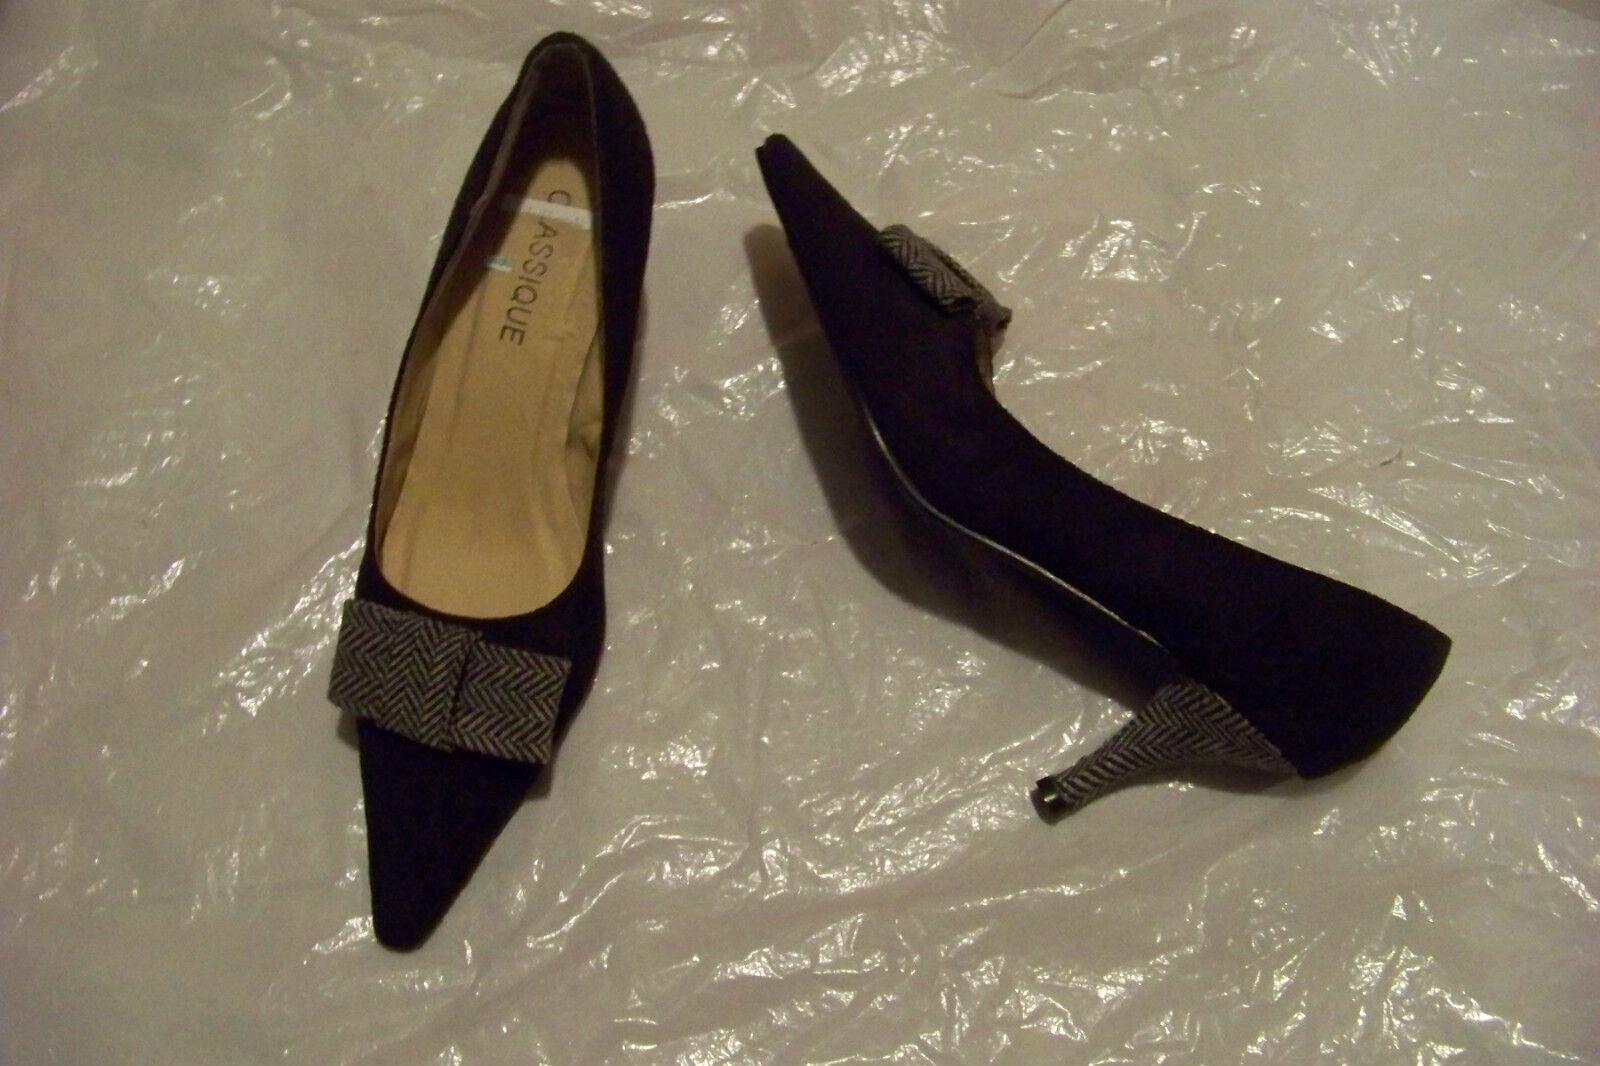 womens classique black shoes fabric bow heels shoes black size 7 b8ed15